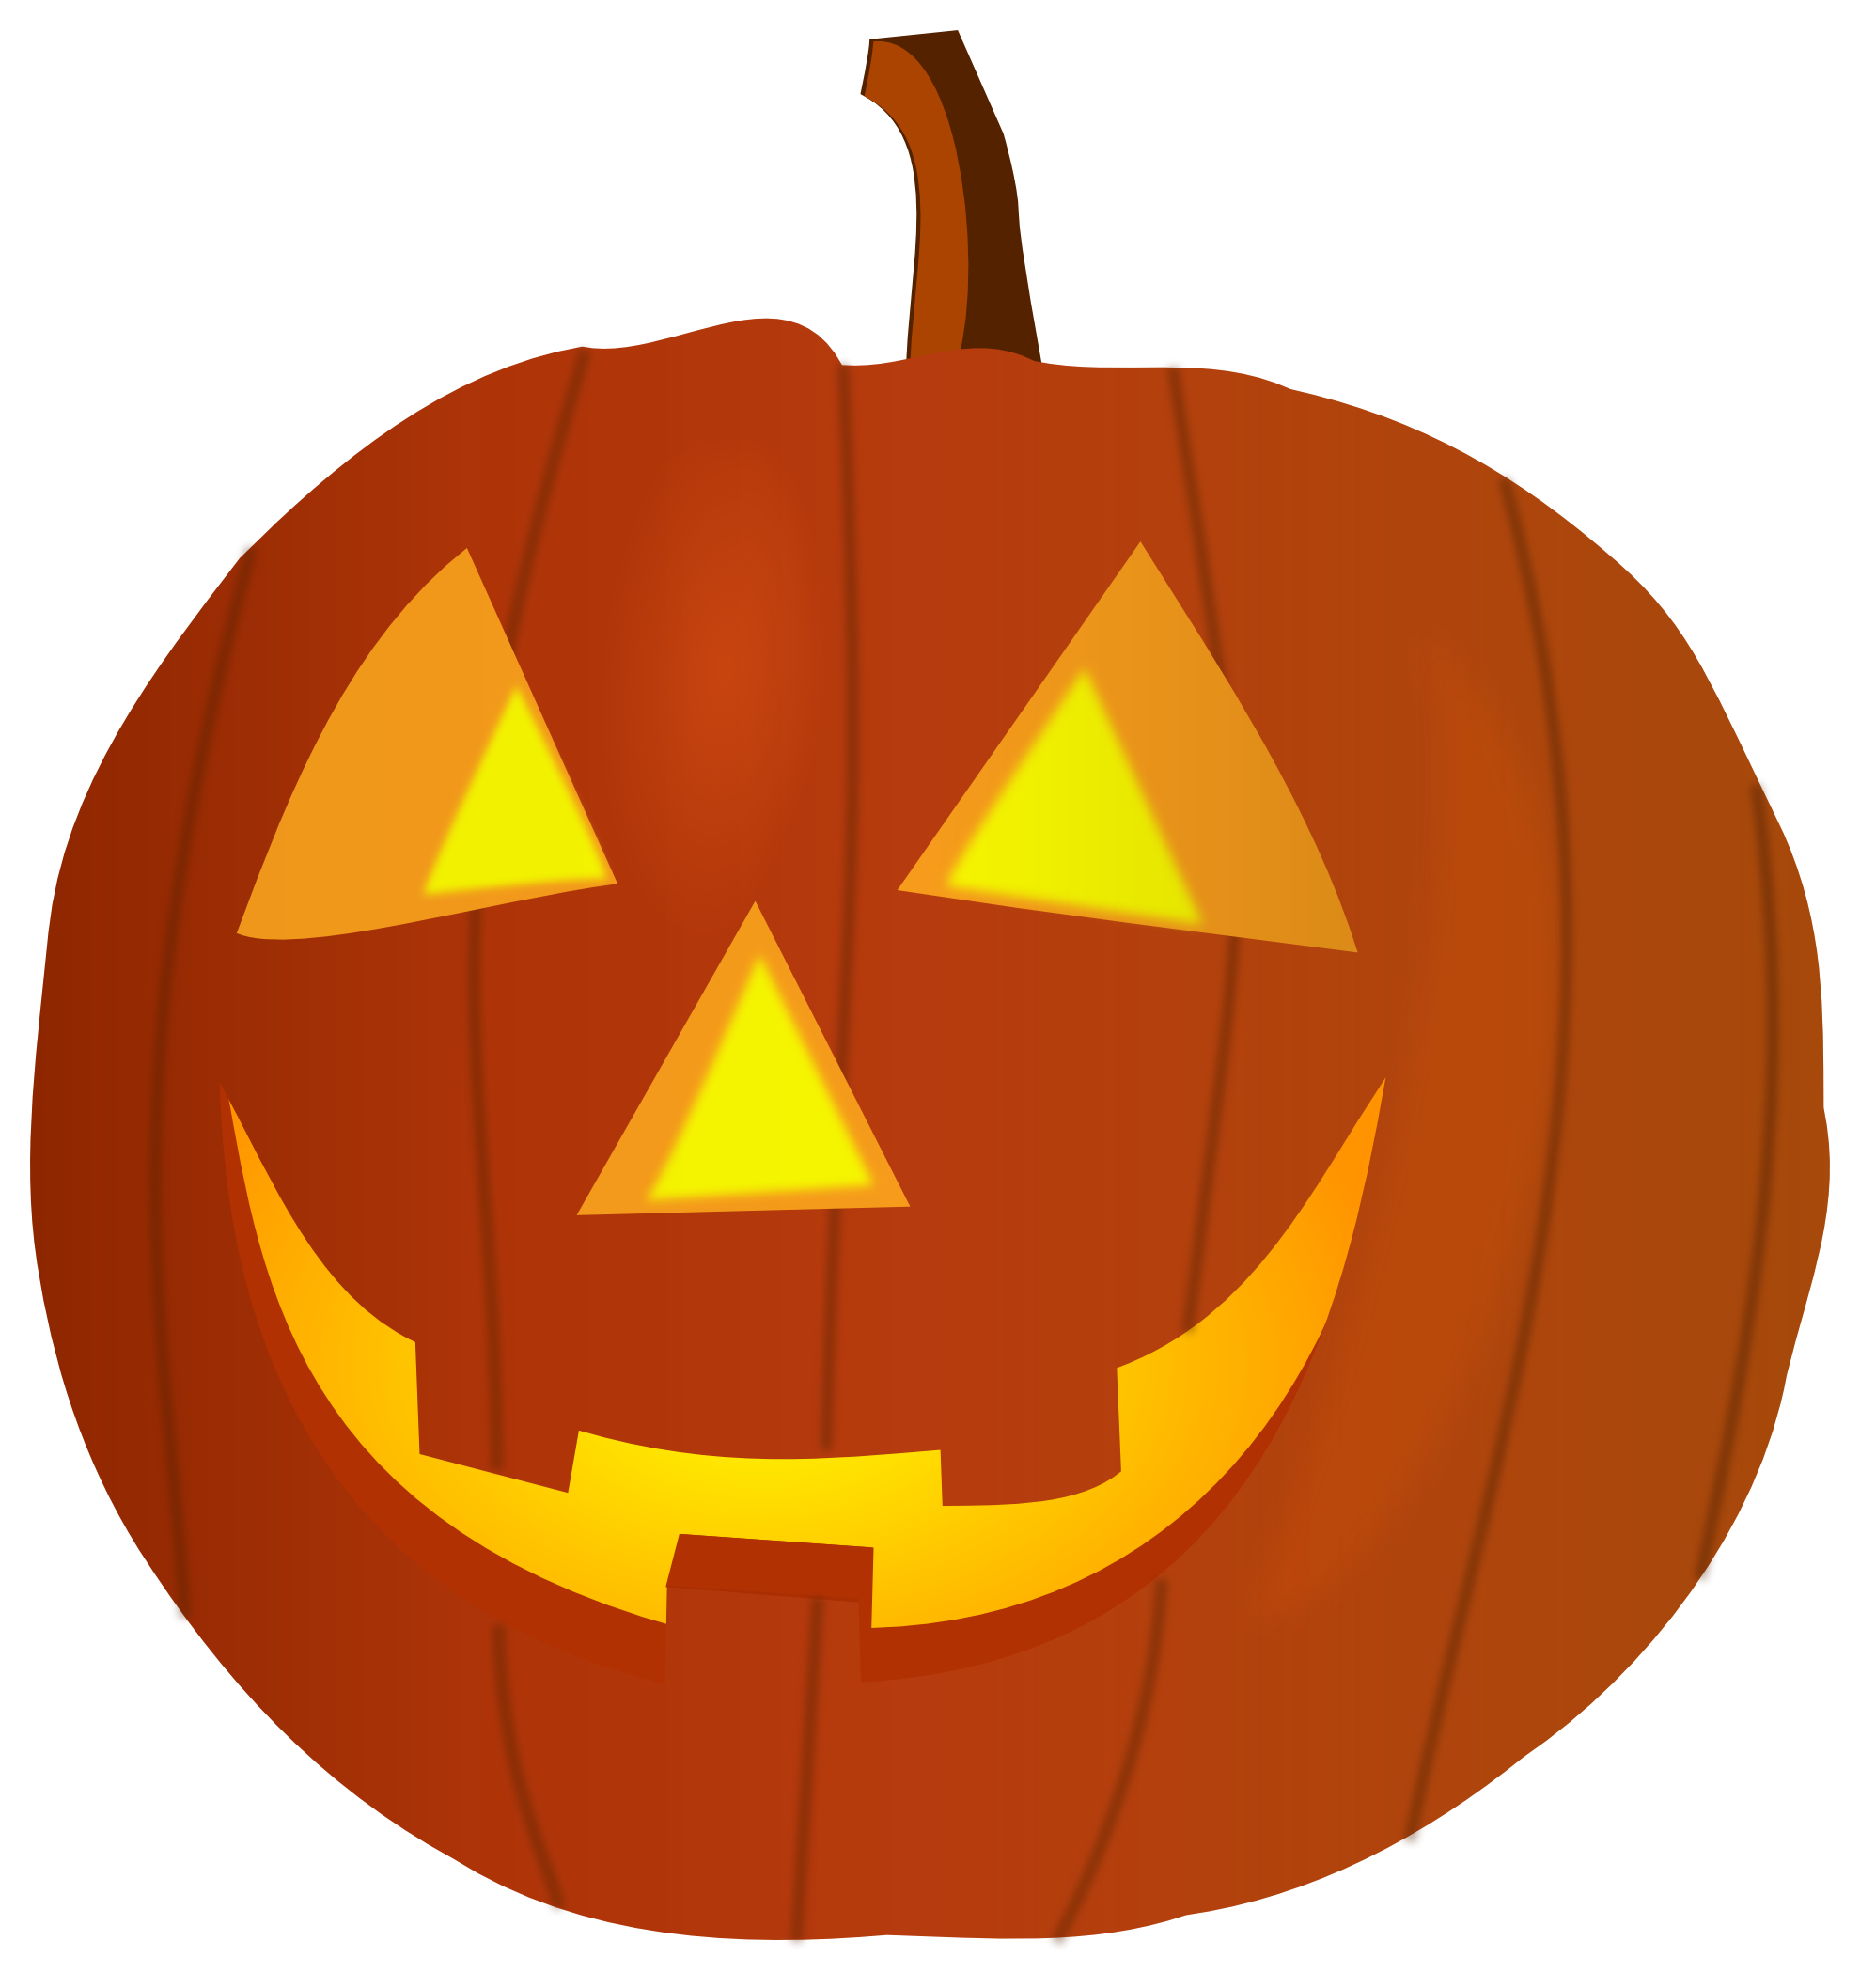 Happy halloween cyberuse free. Pumpkin clipart day